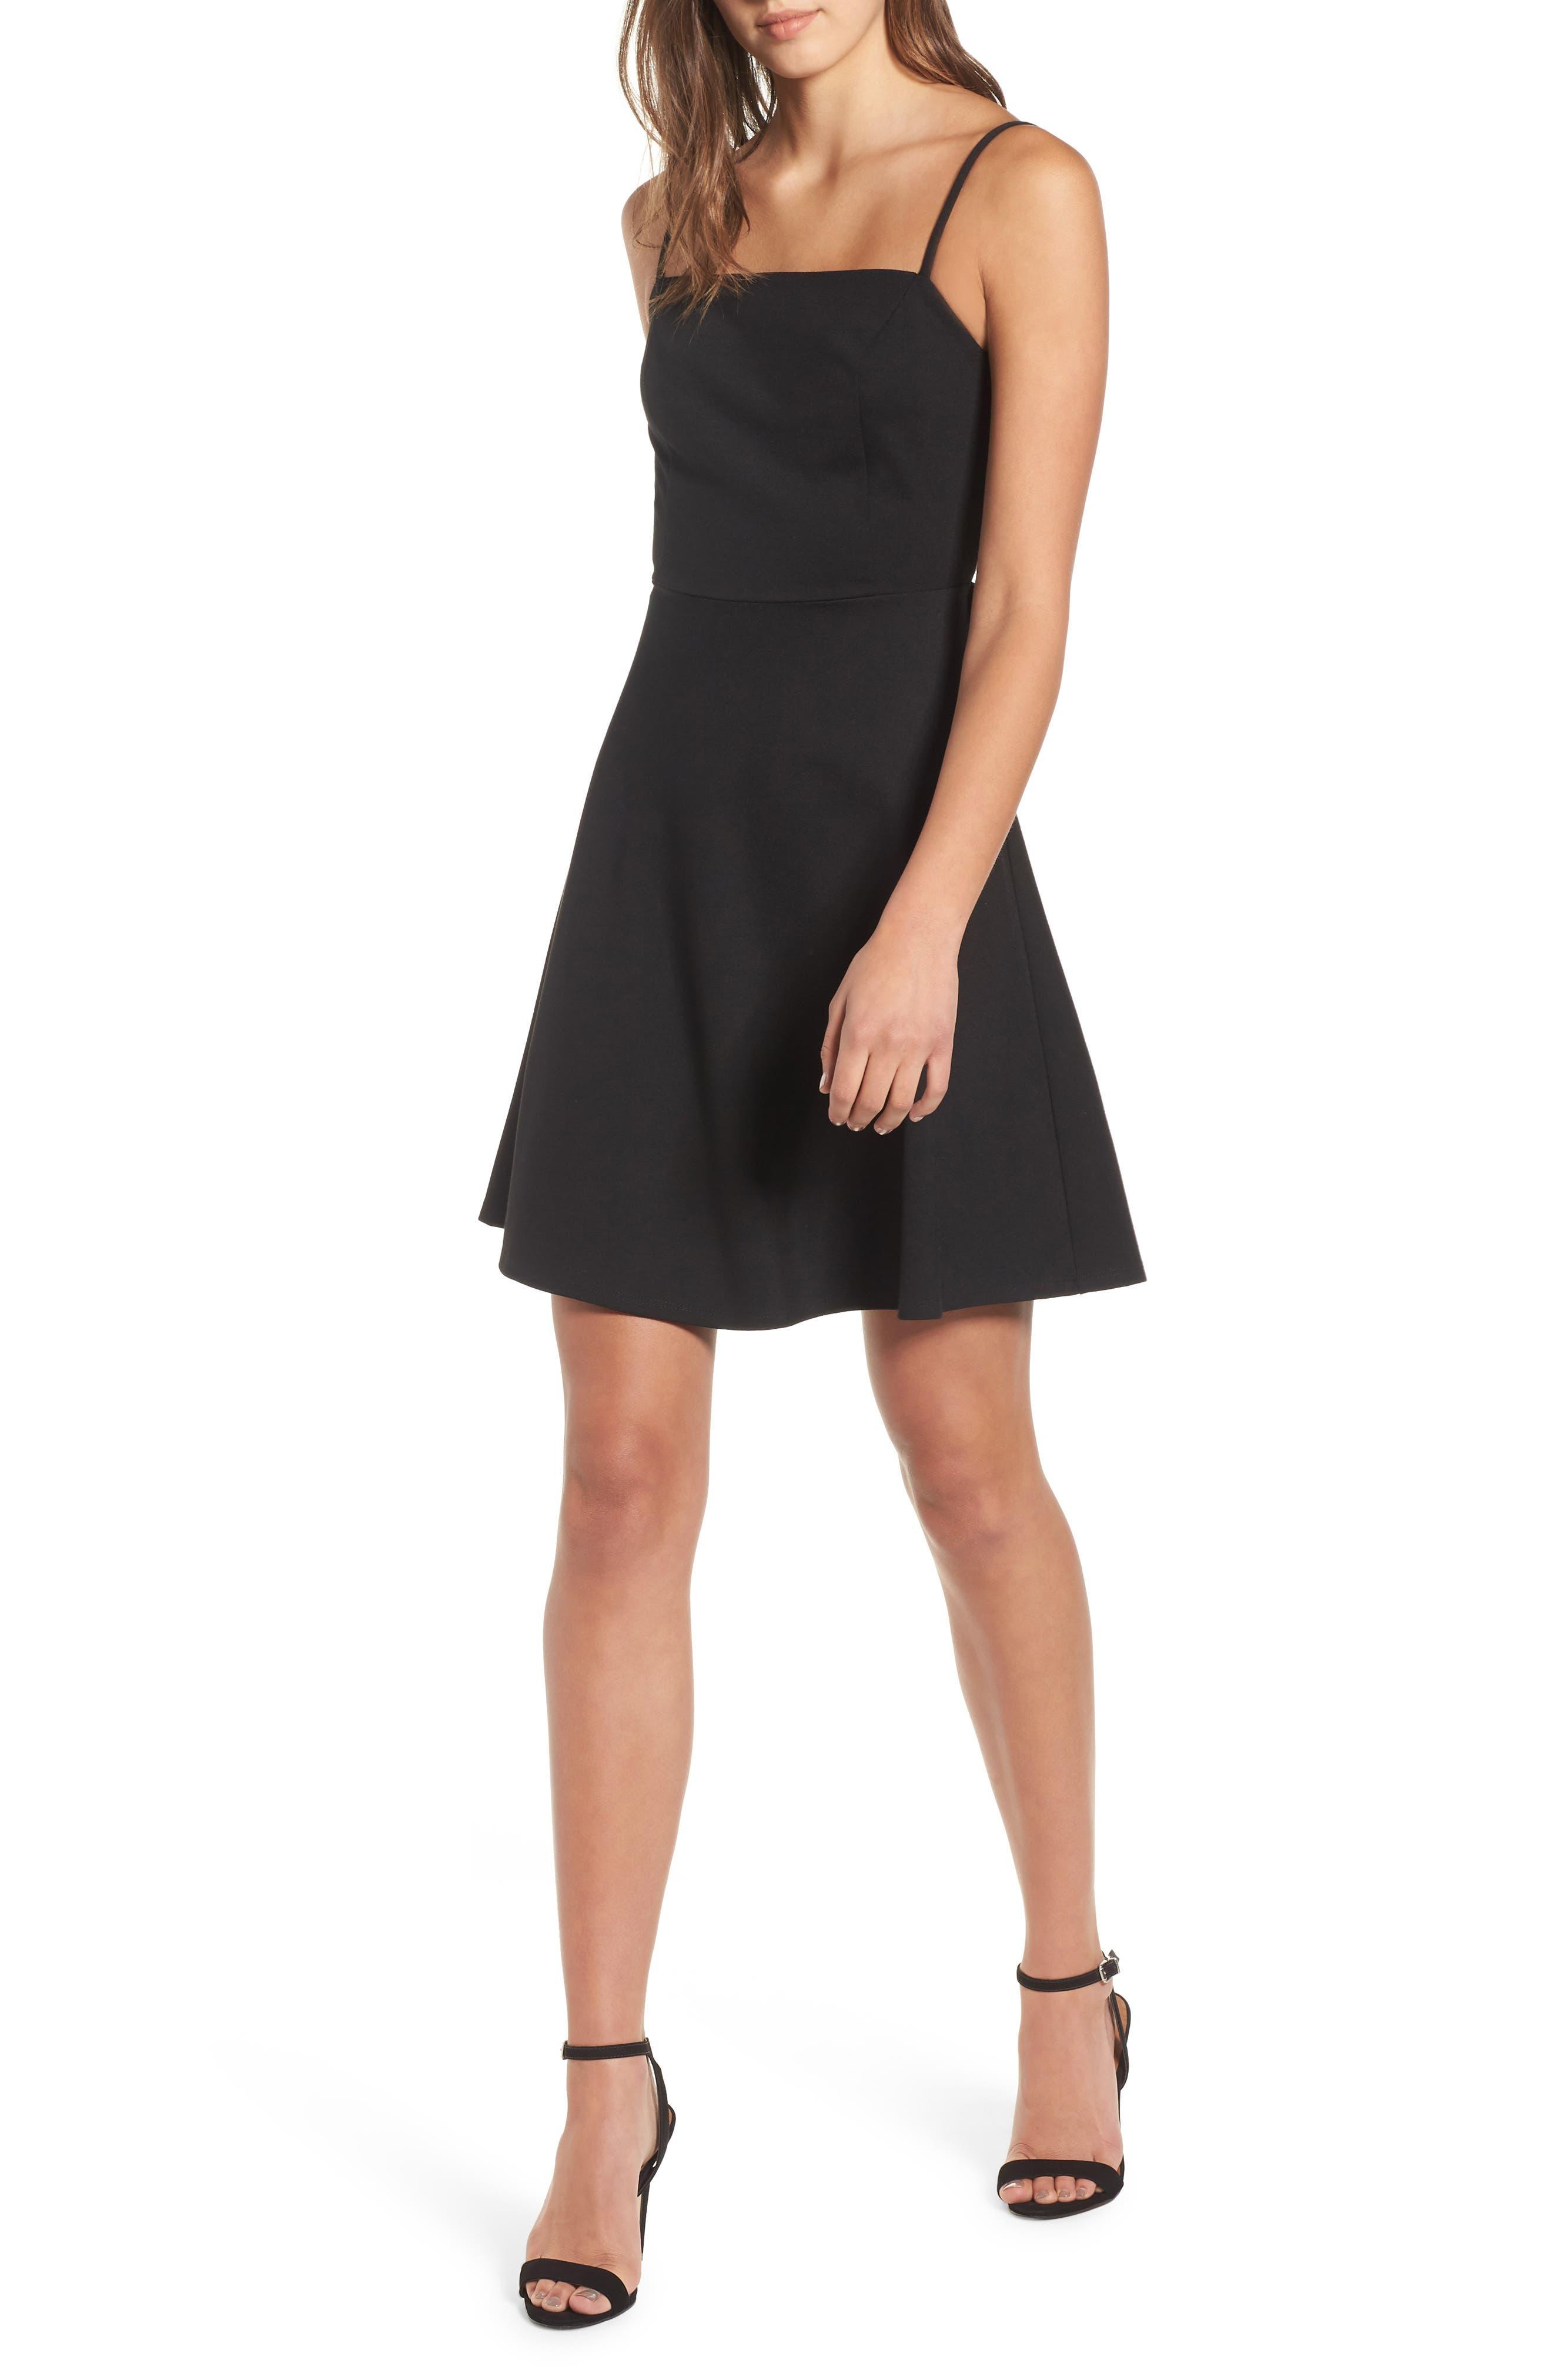 Backless Skater Dress,                             Main thumbnail 1, color,                             Black